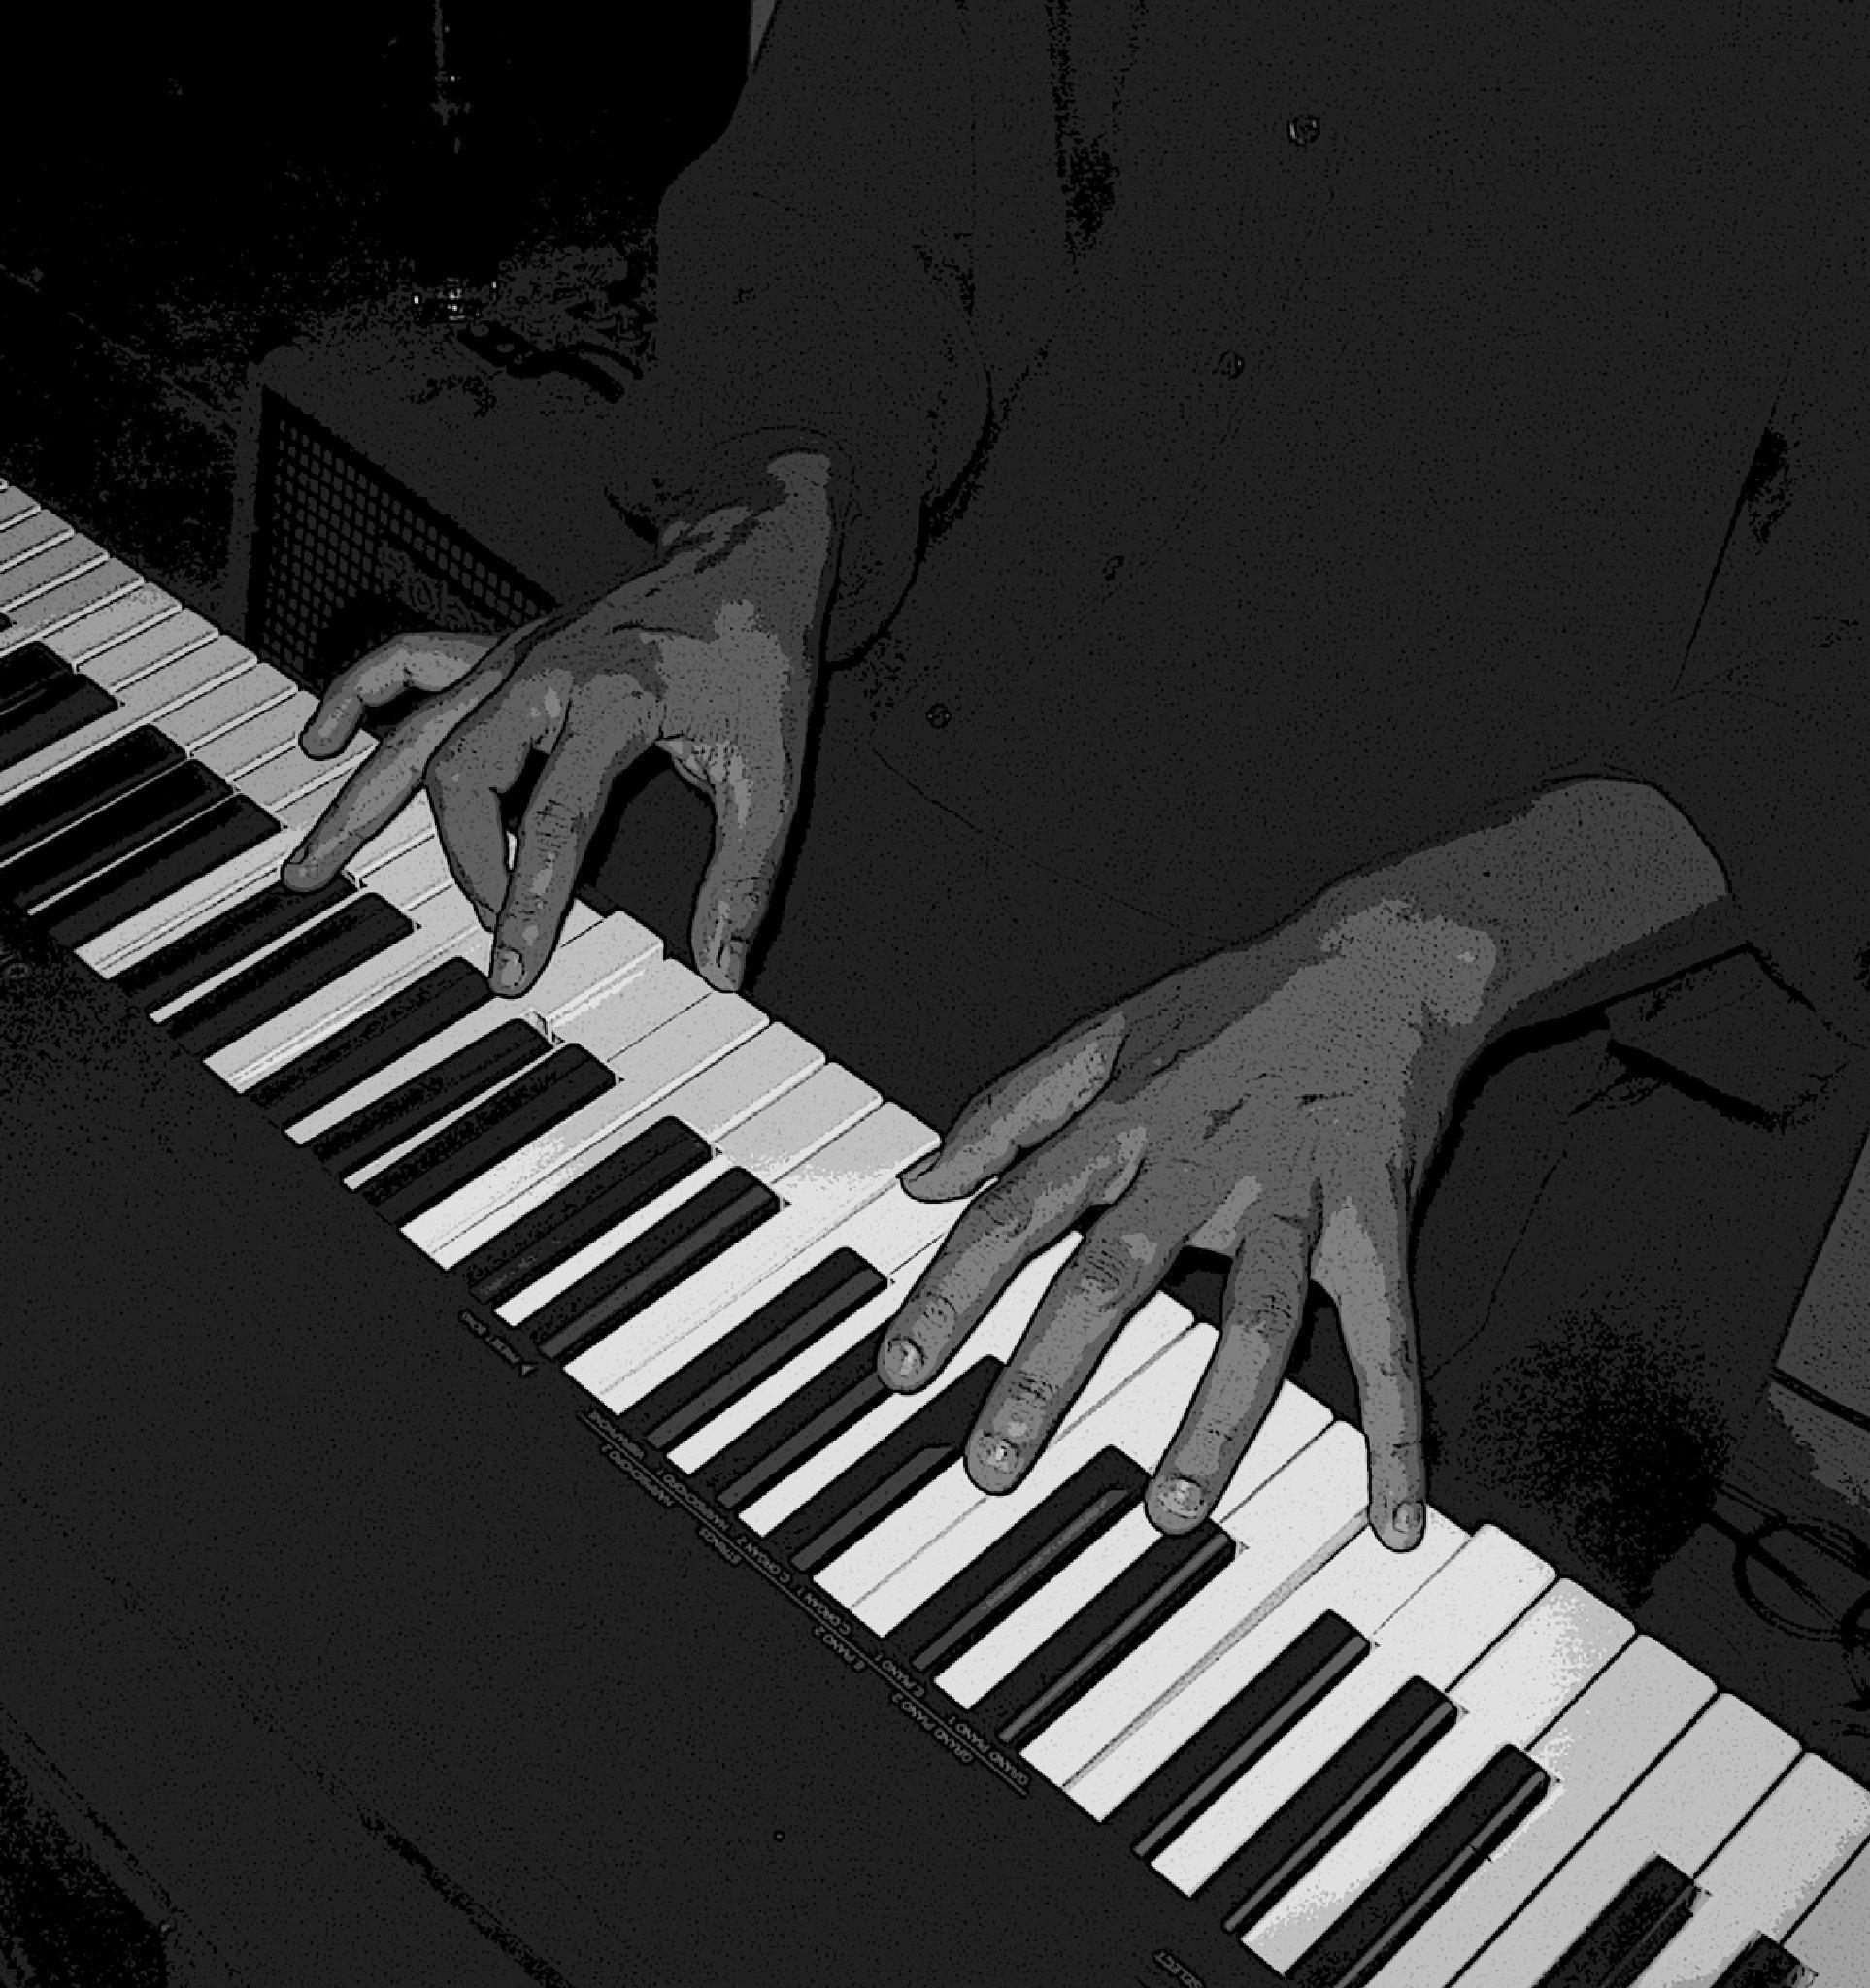 DIEGO RAMIREZ ON PIANO, 2005 by MarilynGraham